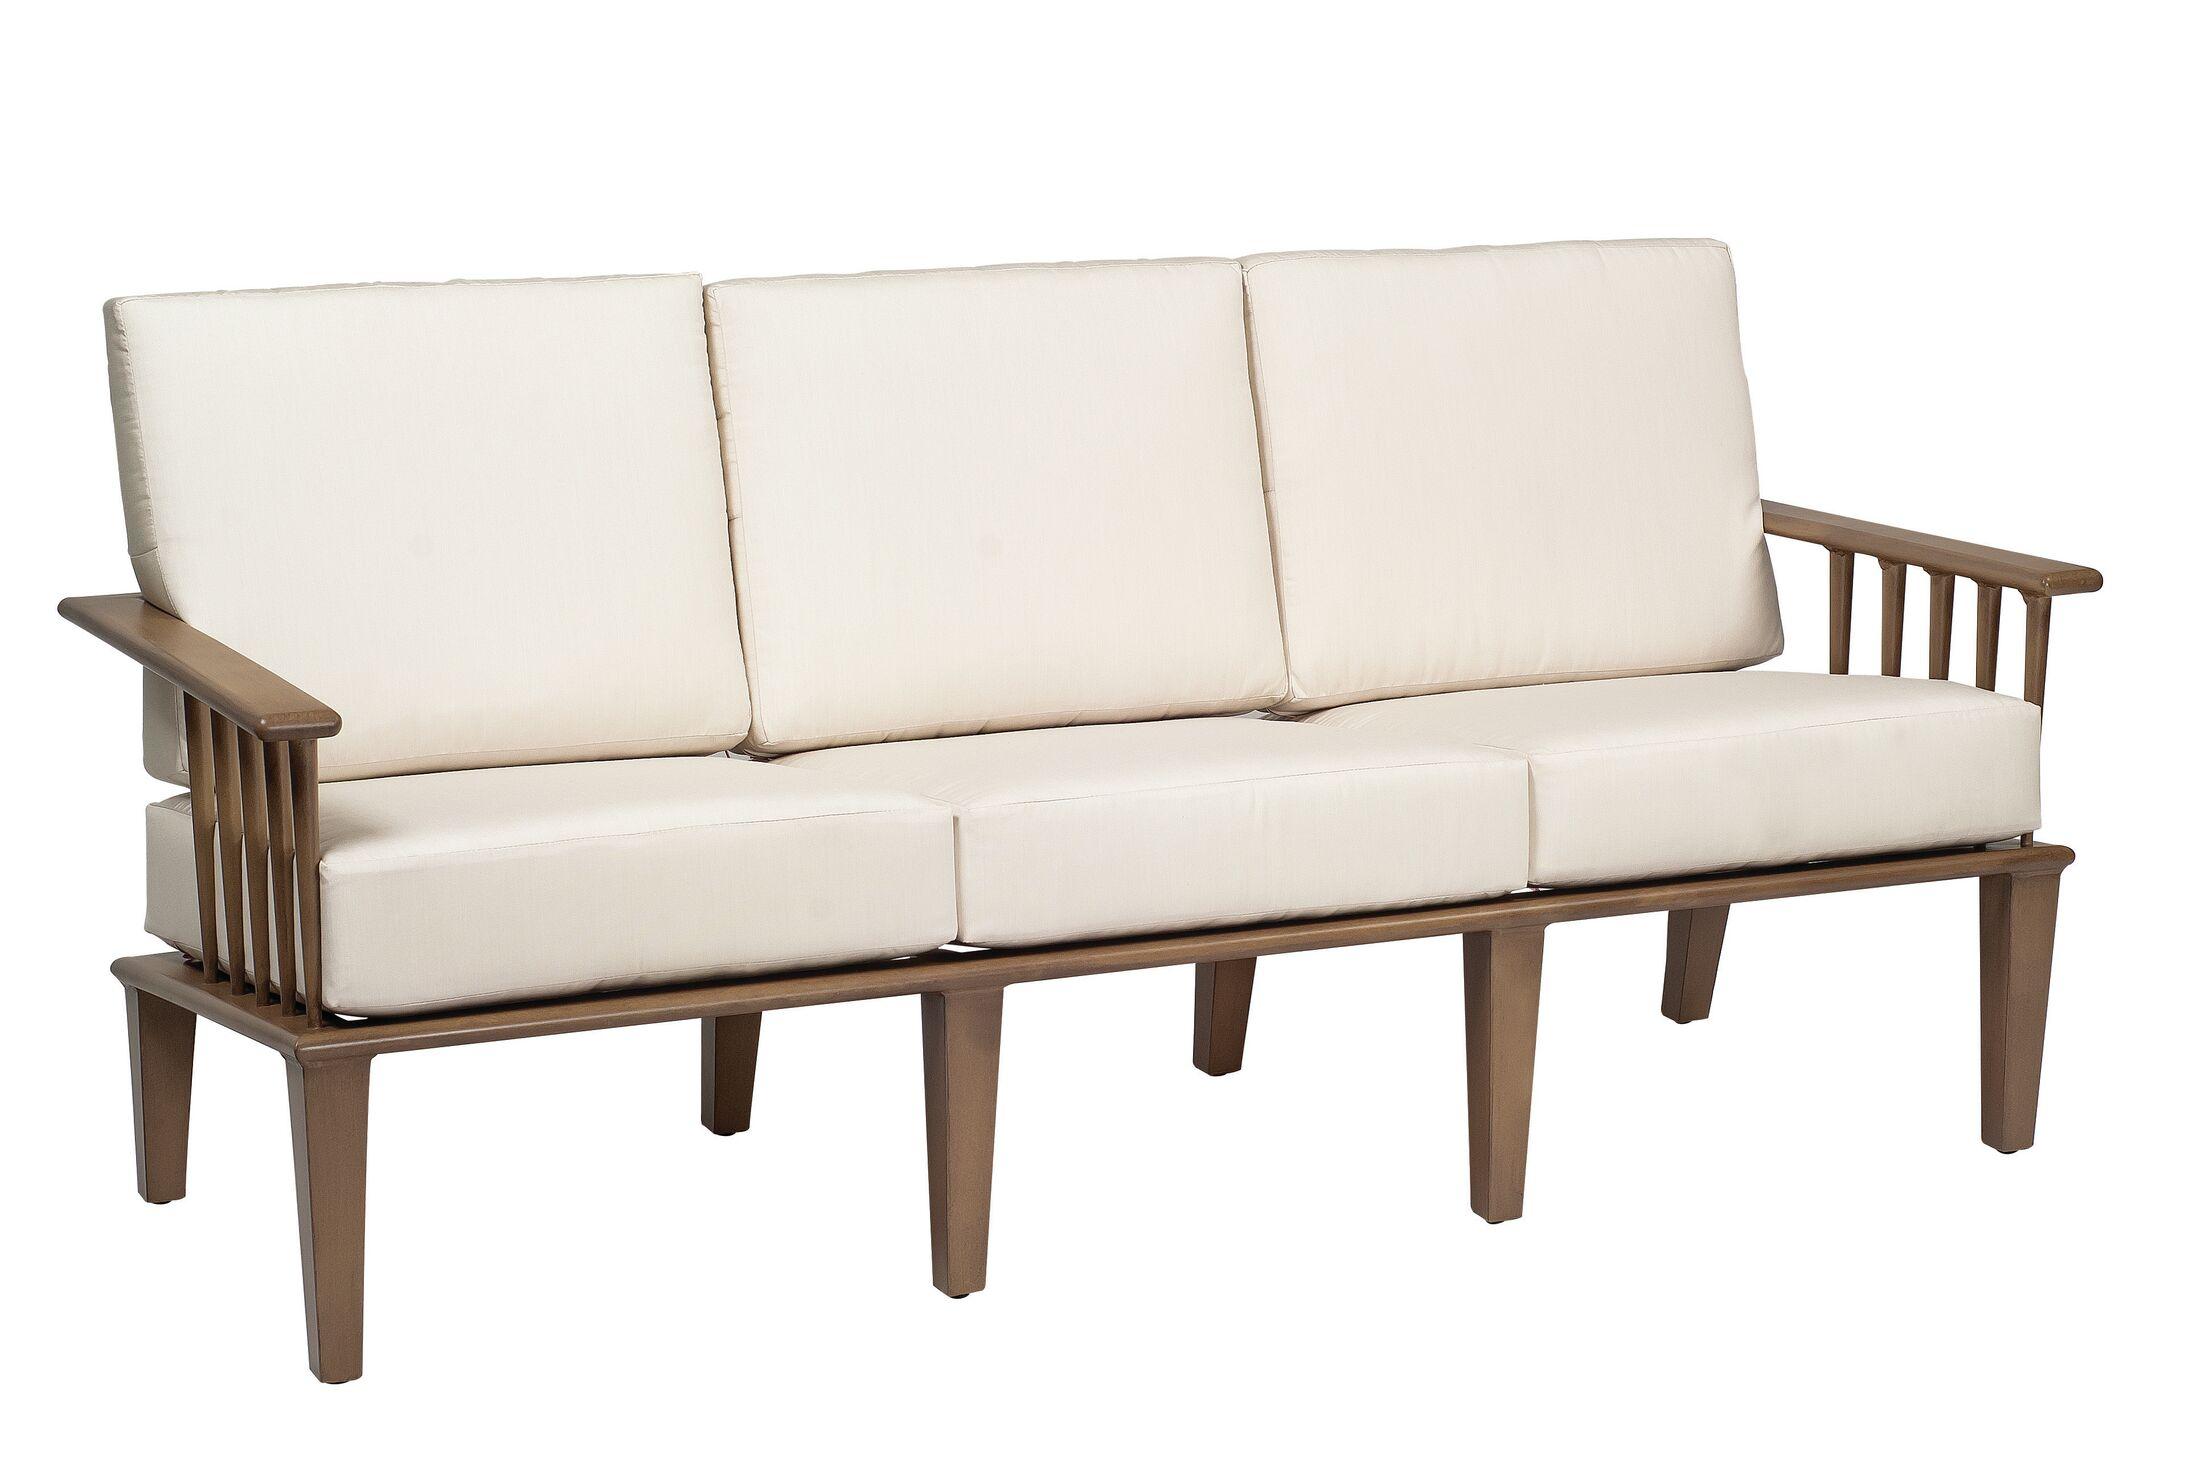 Van Dyke Sofa with Cushions Fabric: Canvas Chestnut